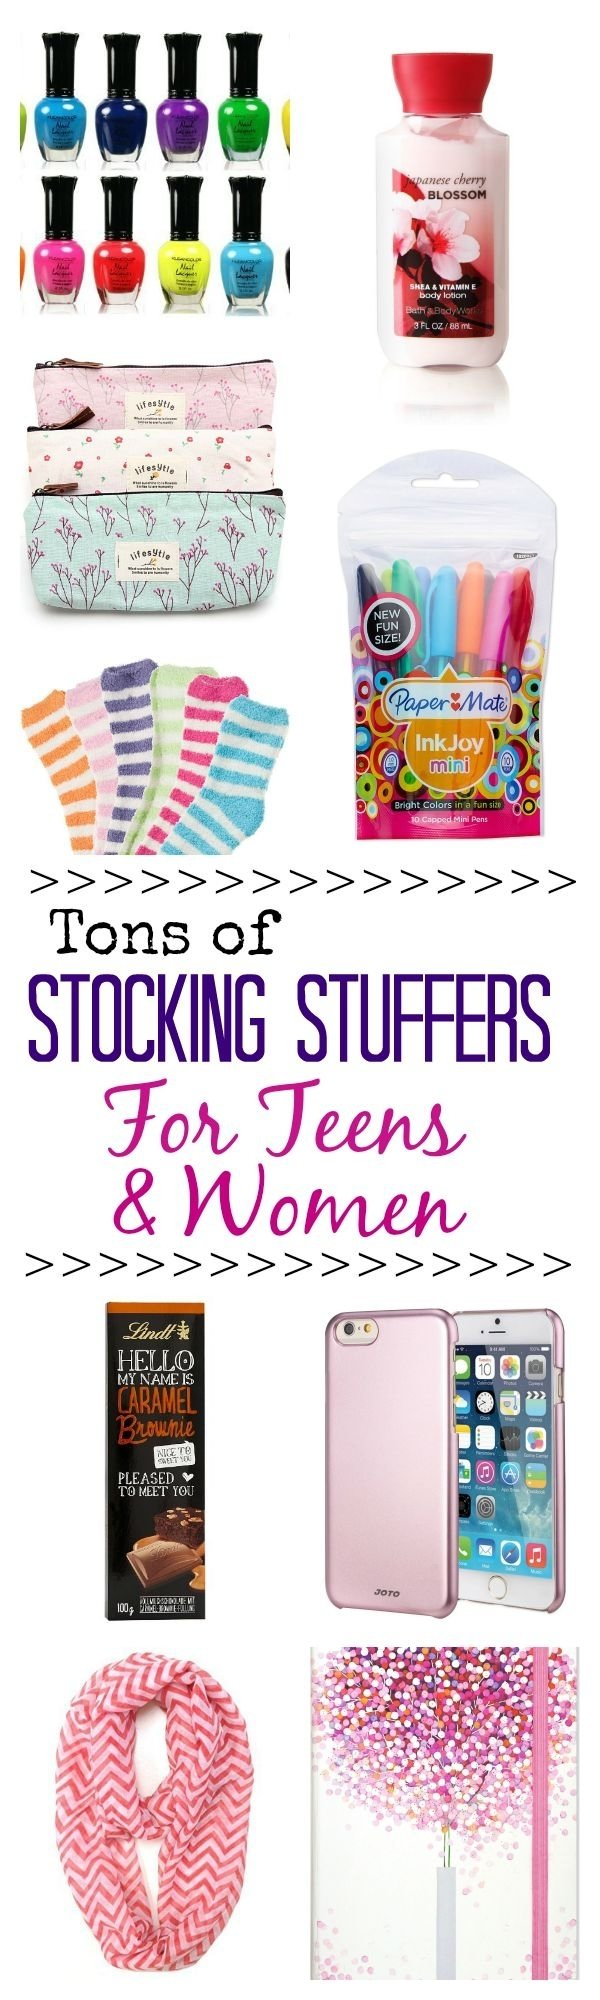 10 Wonderful Christmas Ideas For Tween Girls 30 best christmas images on pinterest gift ideas christmas gift 3 2020